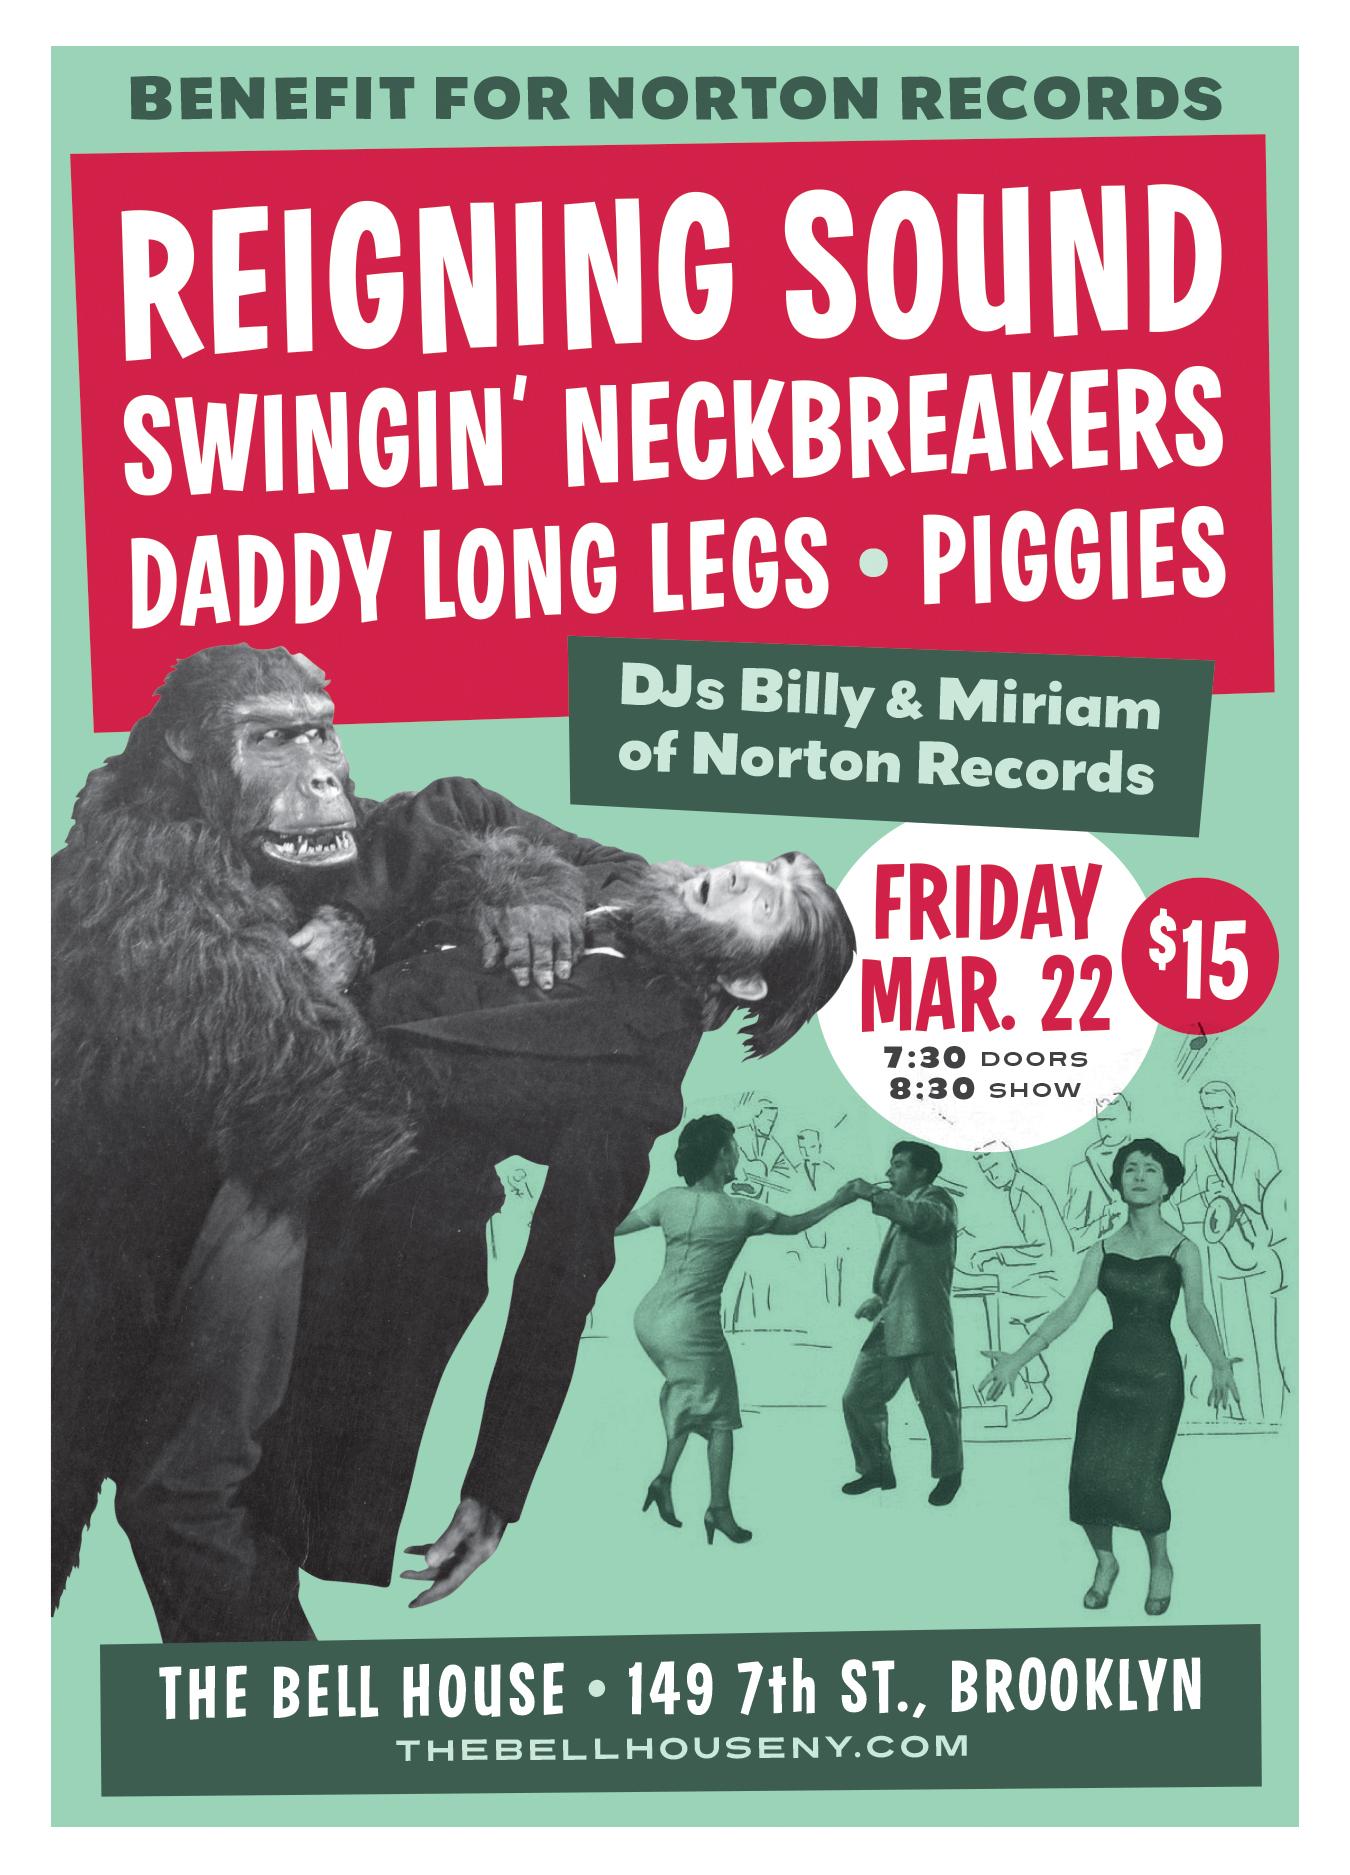 Norton Records benefit poster